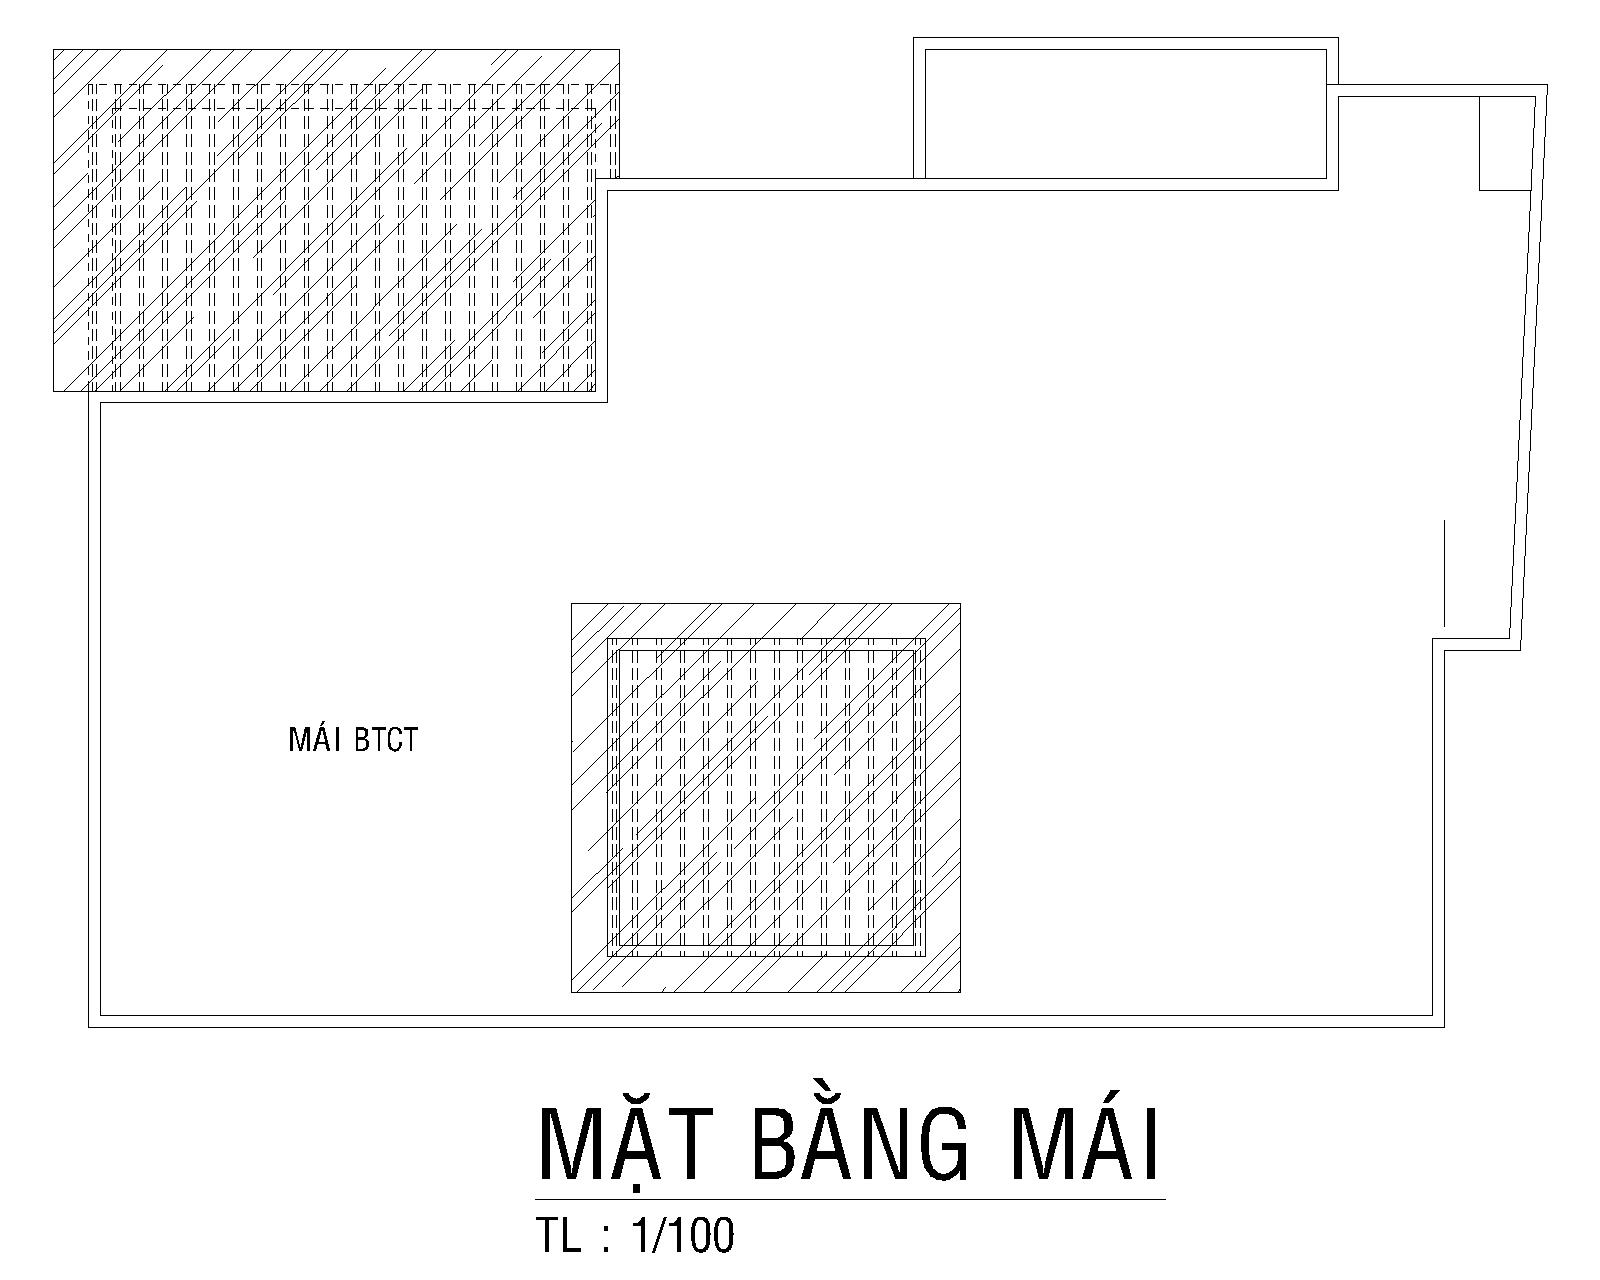 Mat Bang Mai Biet Thu Vuon Chu Tu